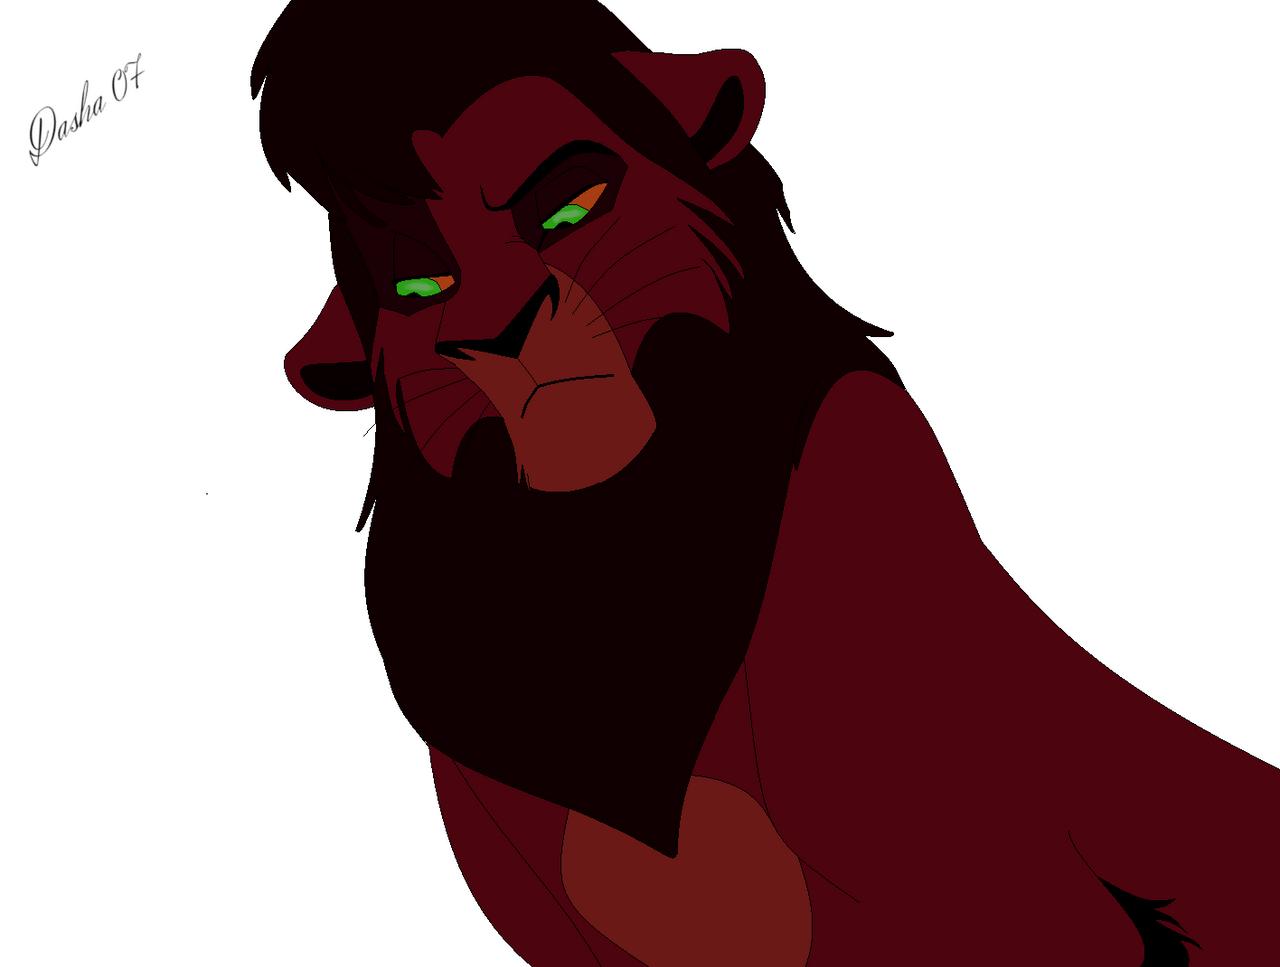 Kovu. The Lion King 2. by Dasha-Ukrainian on DeviantArt